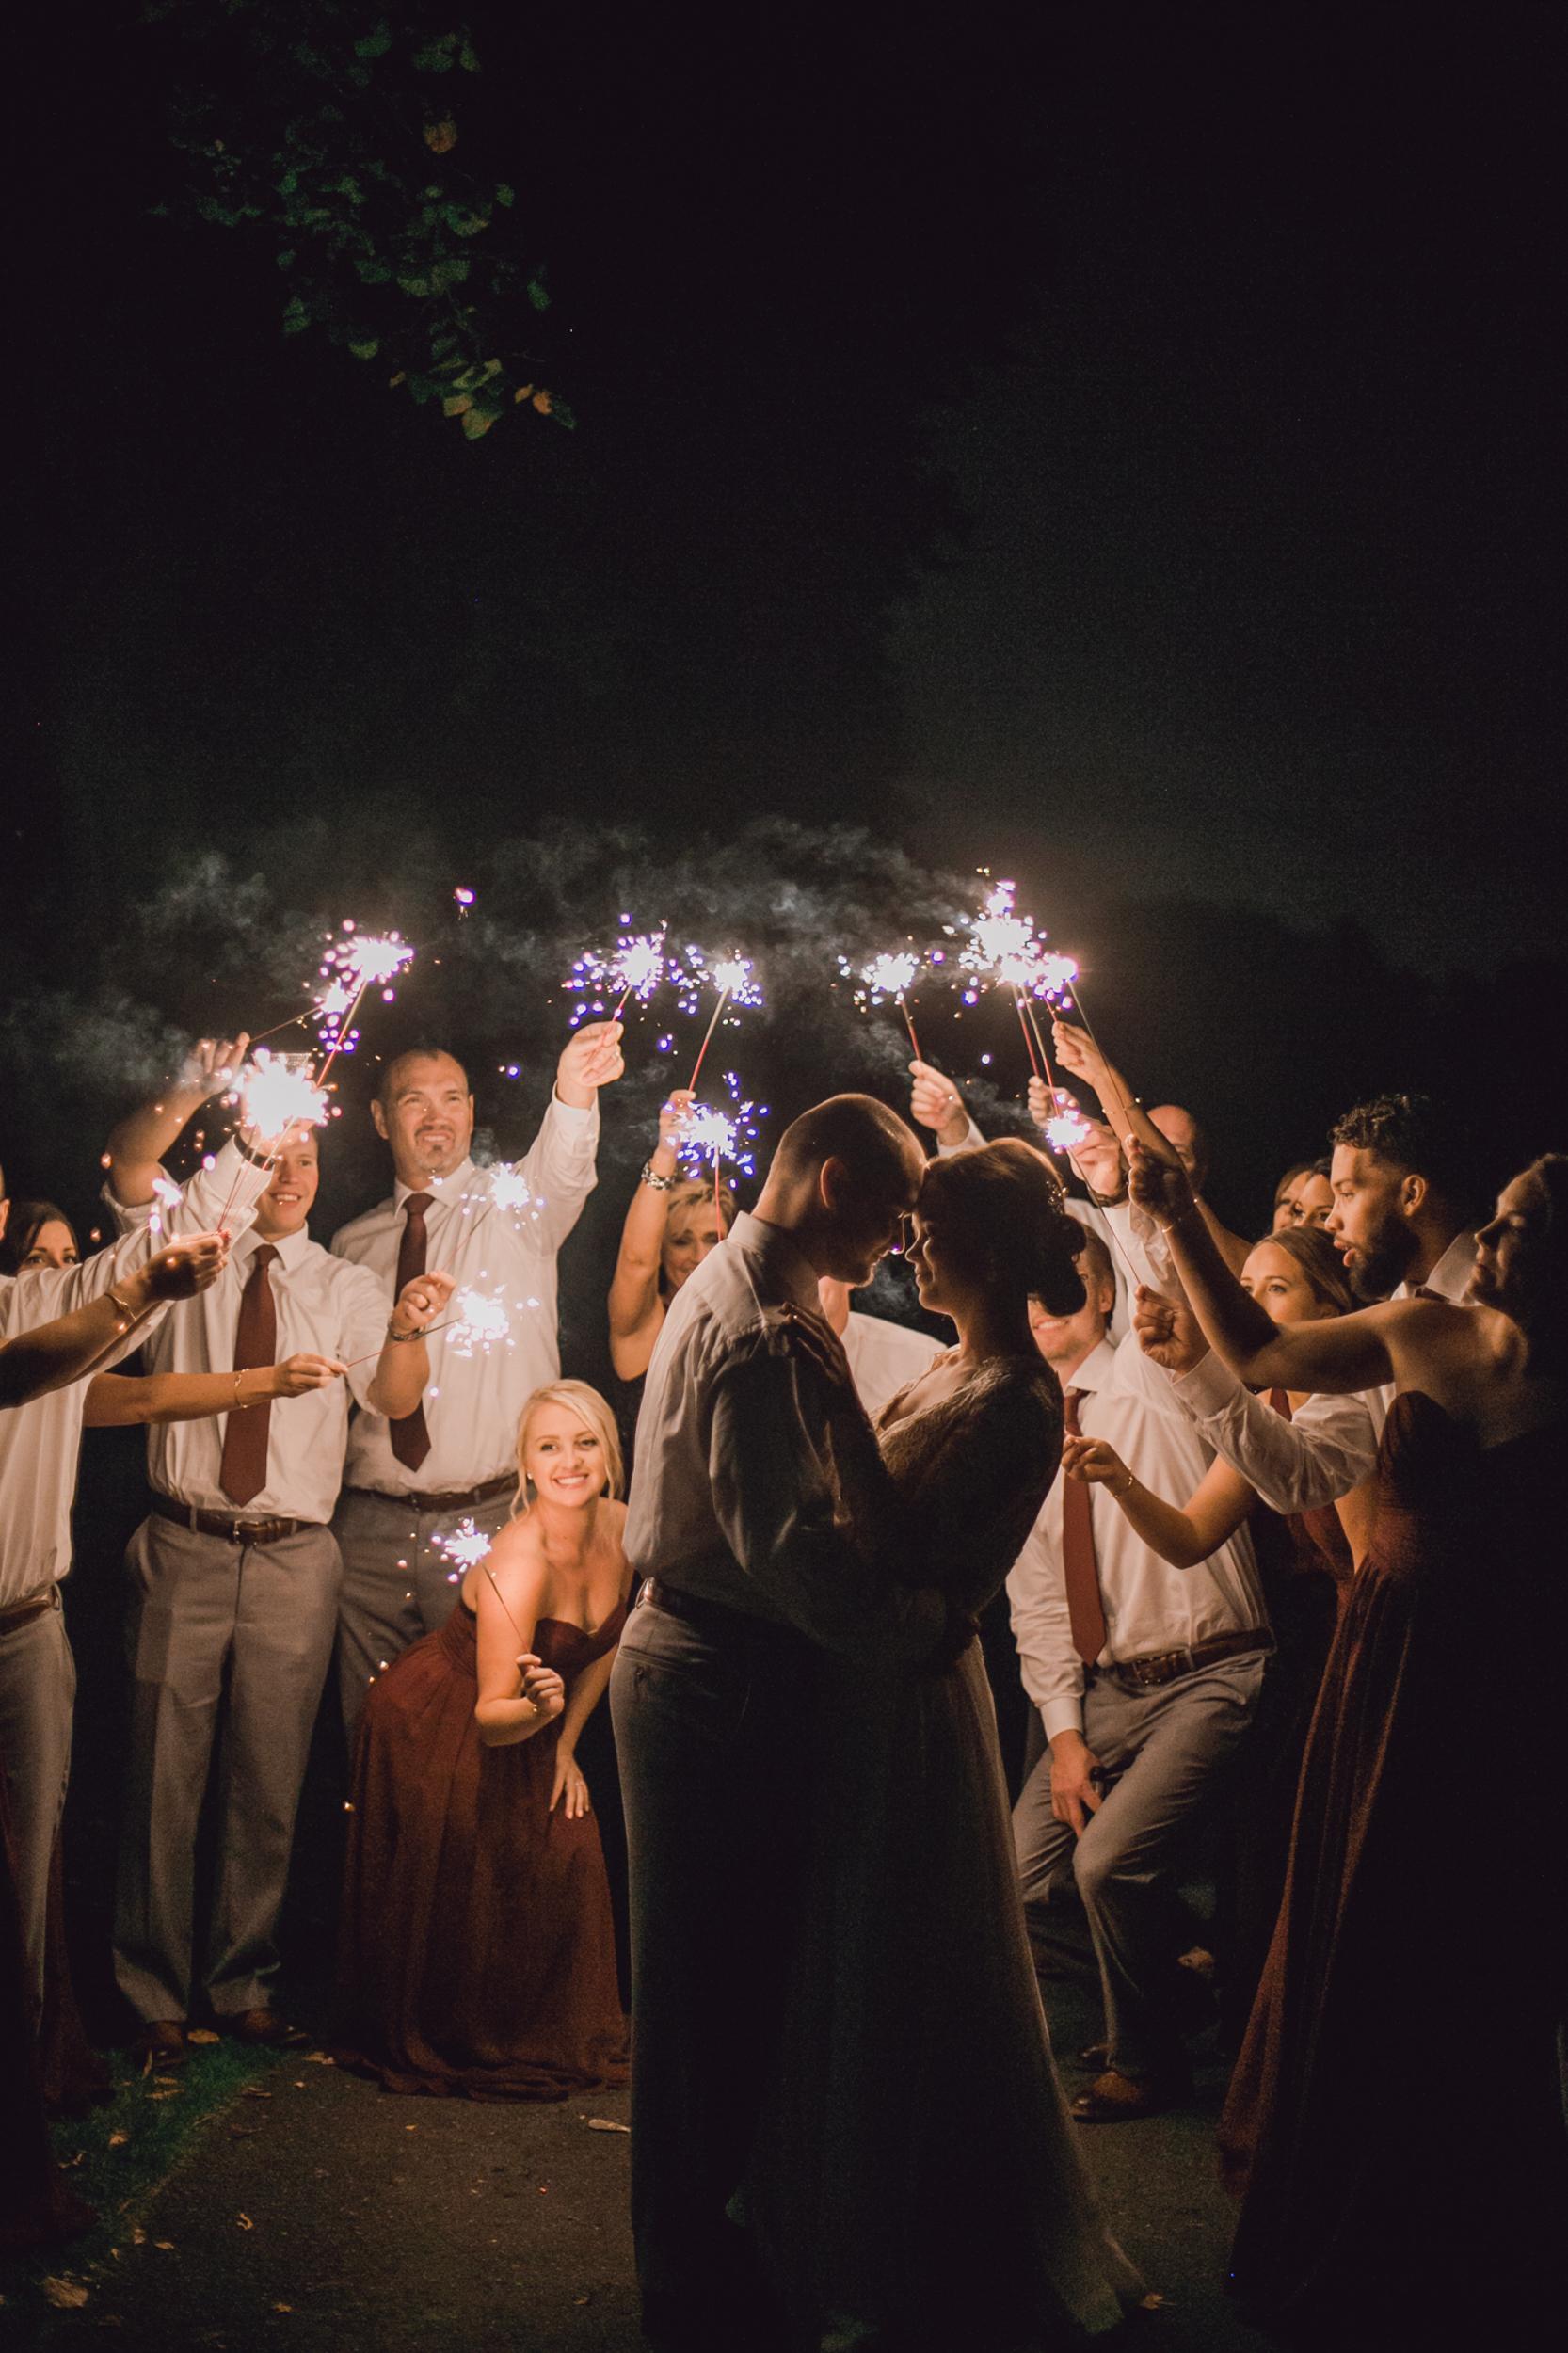 wedding-photography-dark-moody-rustic-details-11.jpg